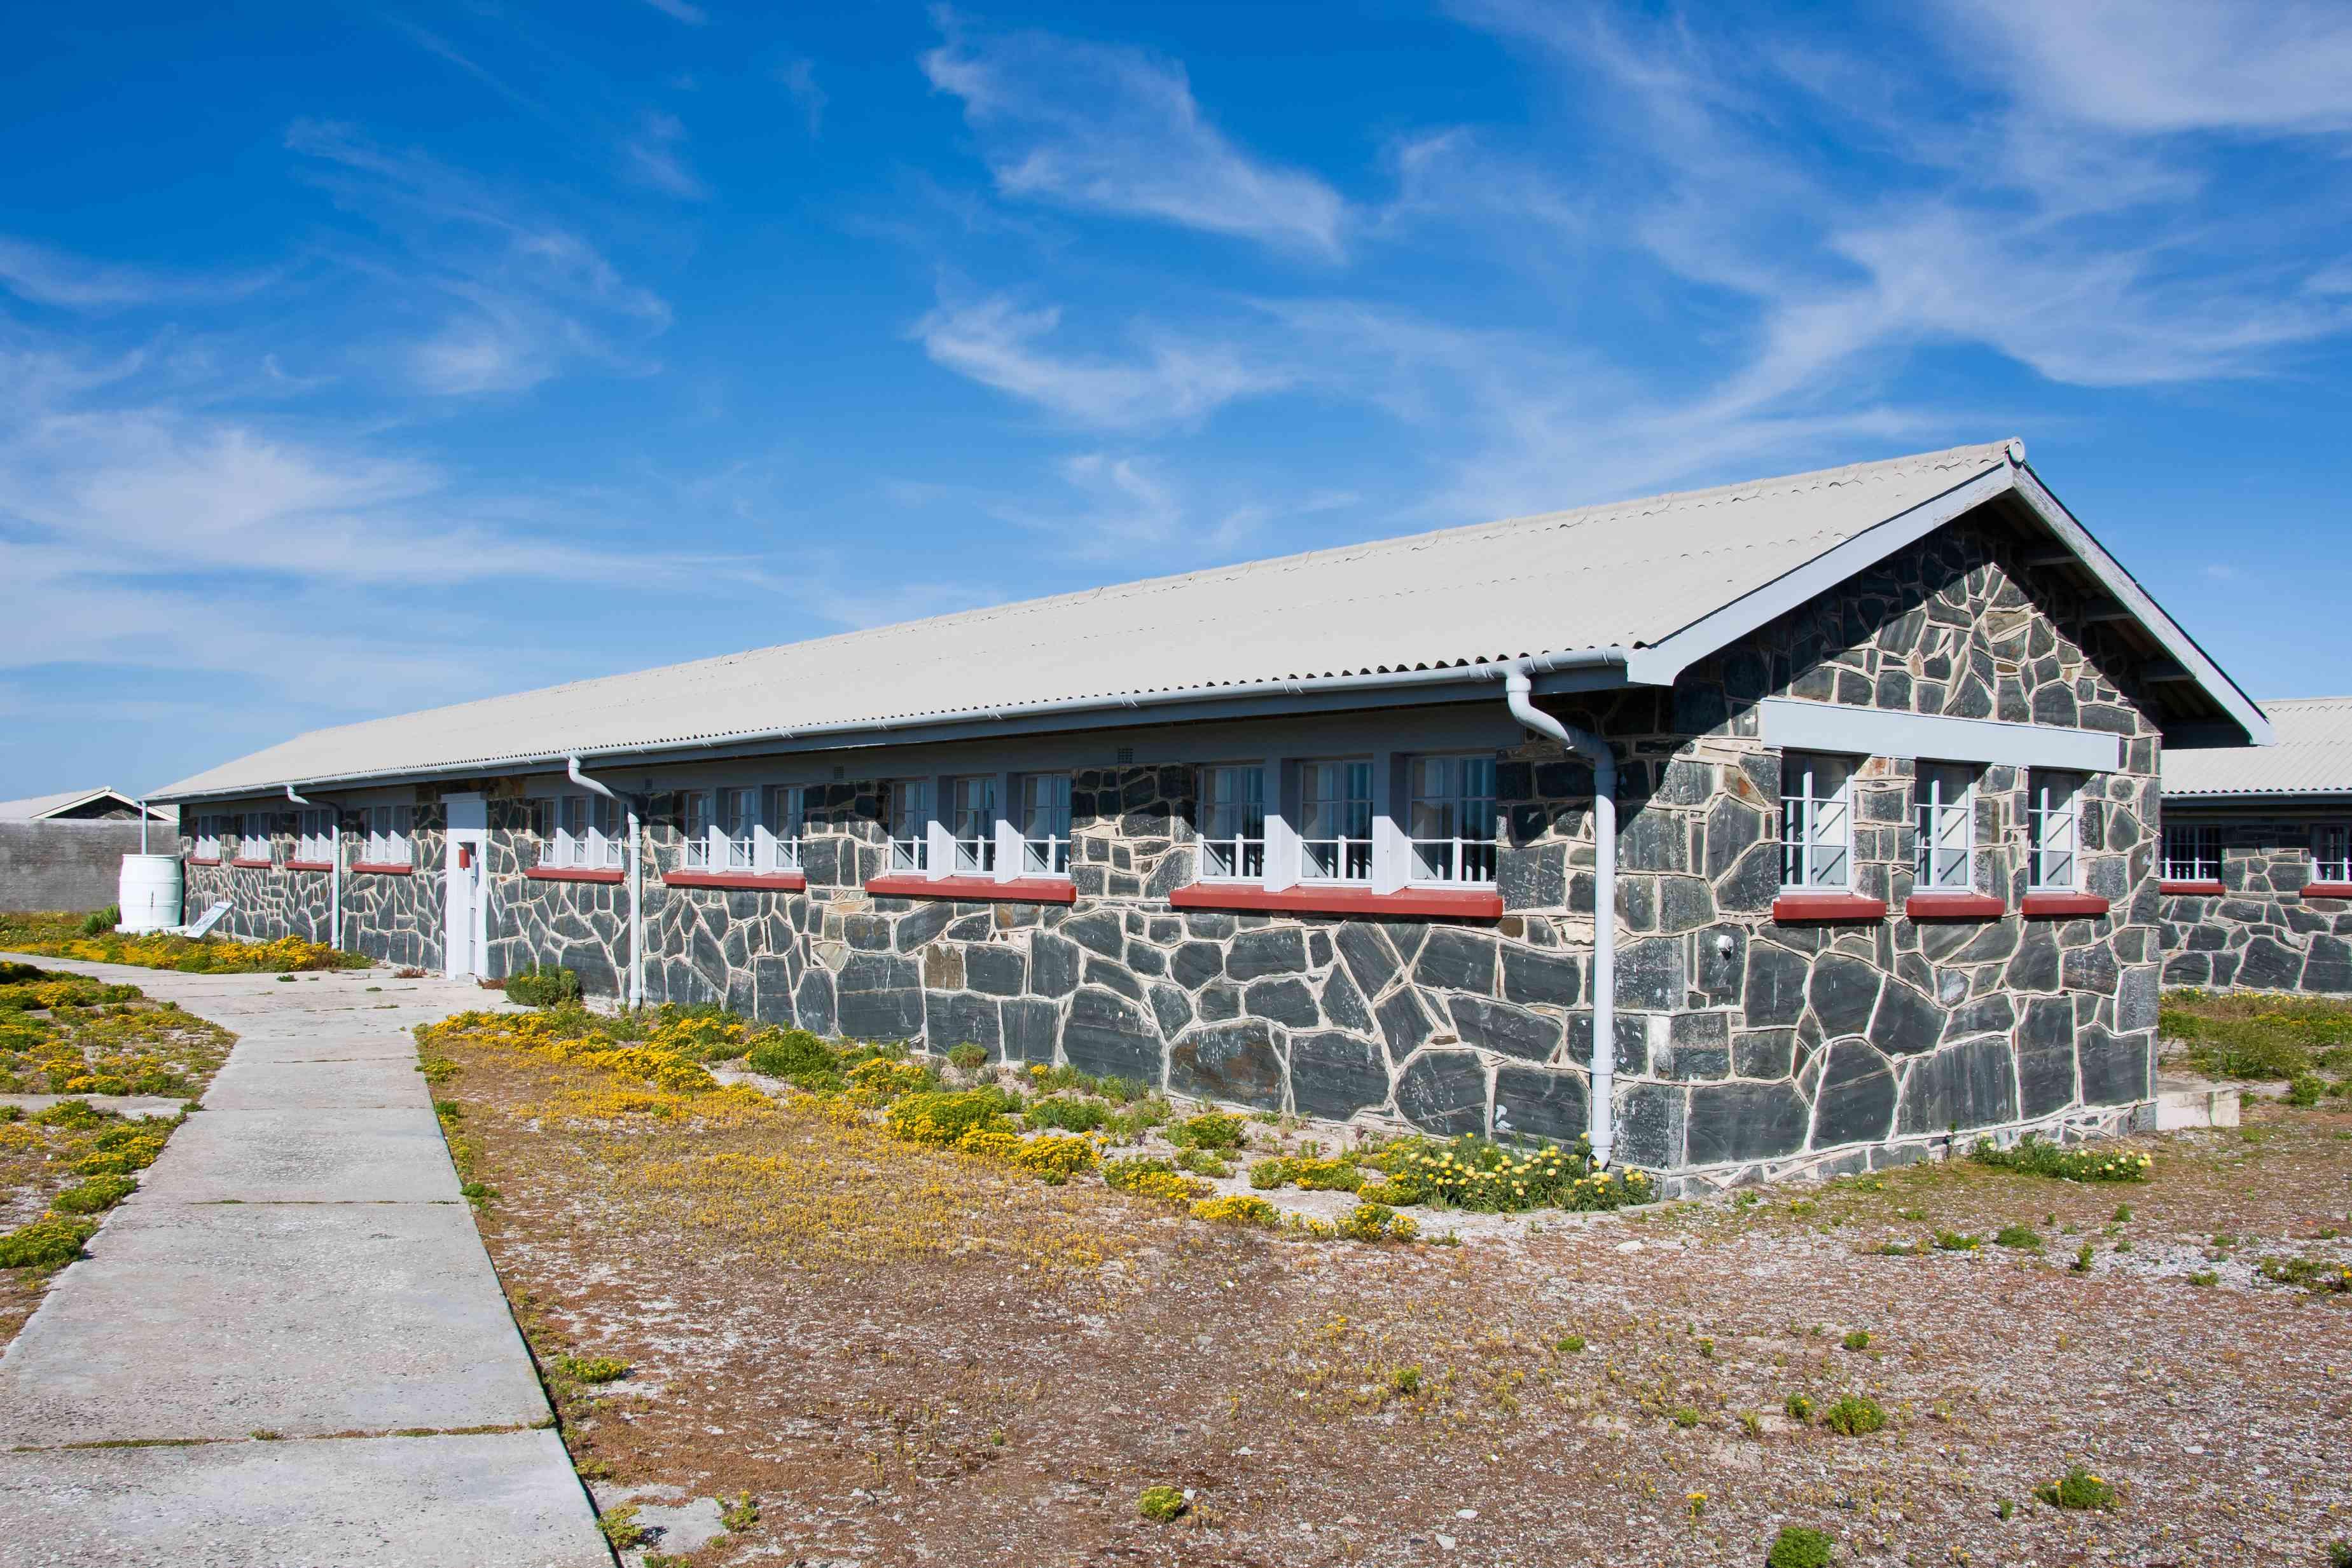 Prison Barrack on Robben Island